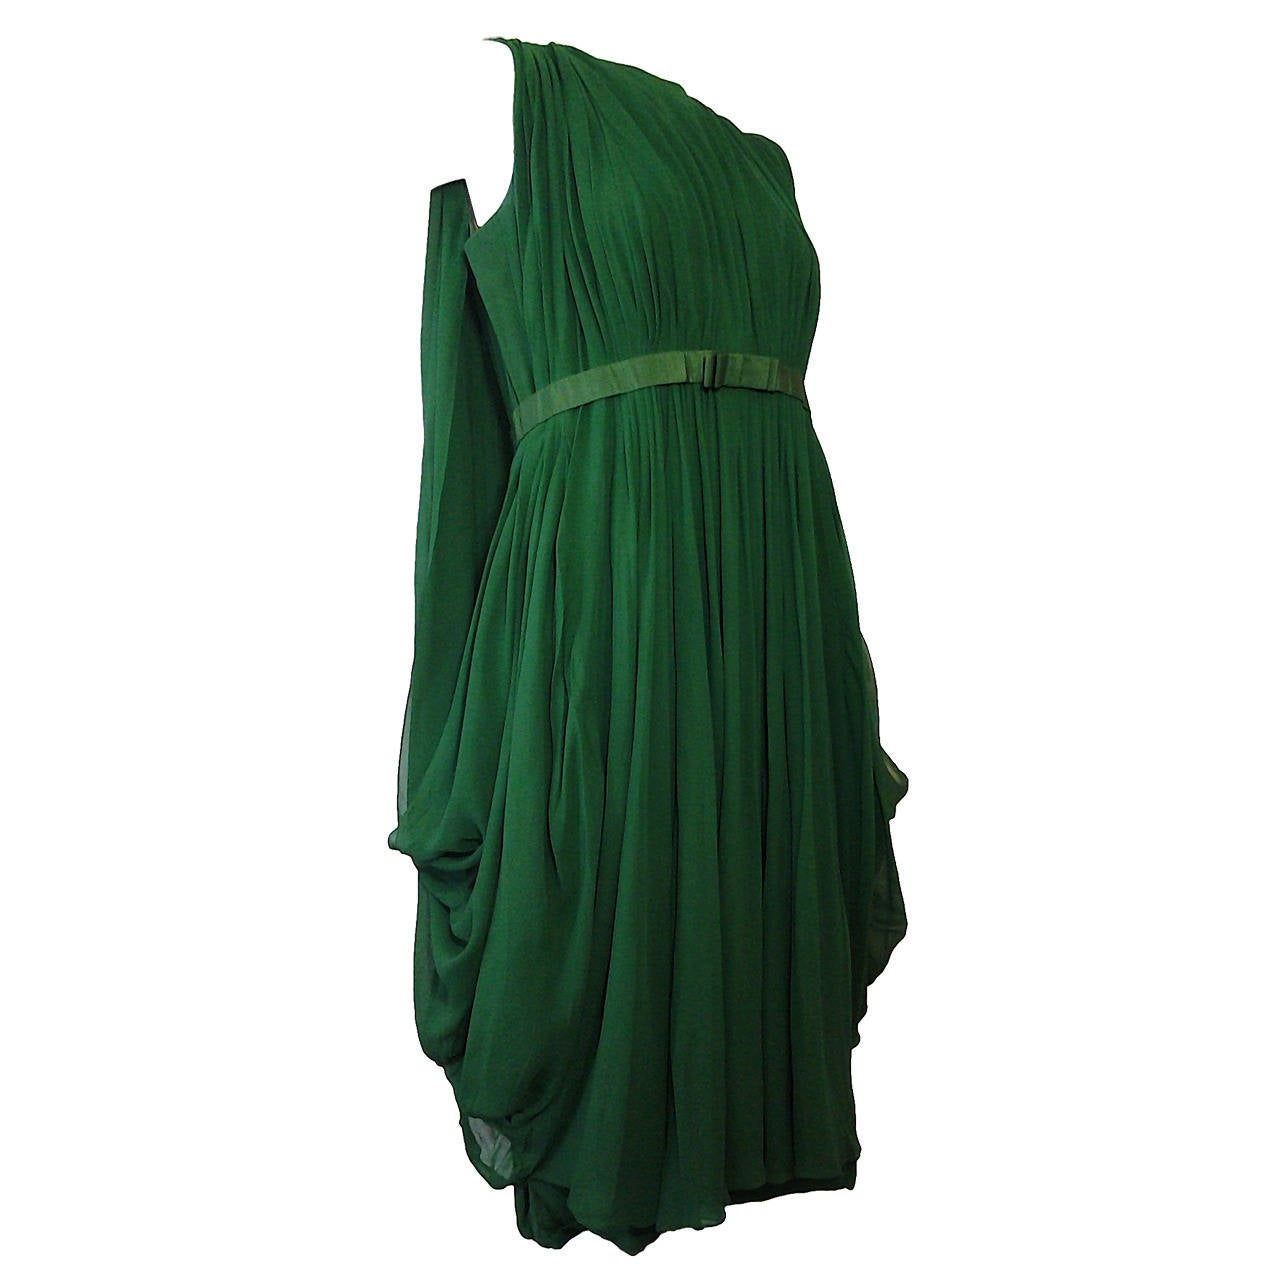 Saks Wedding Gowns: 1960s Saks Fifth Avenue Emerald Silk Chiffon Cocktail